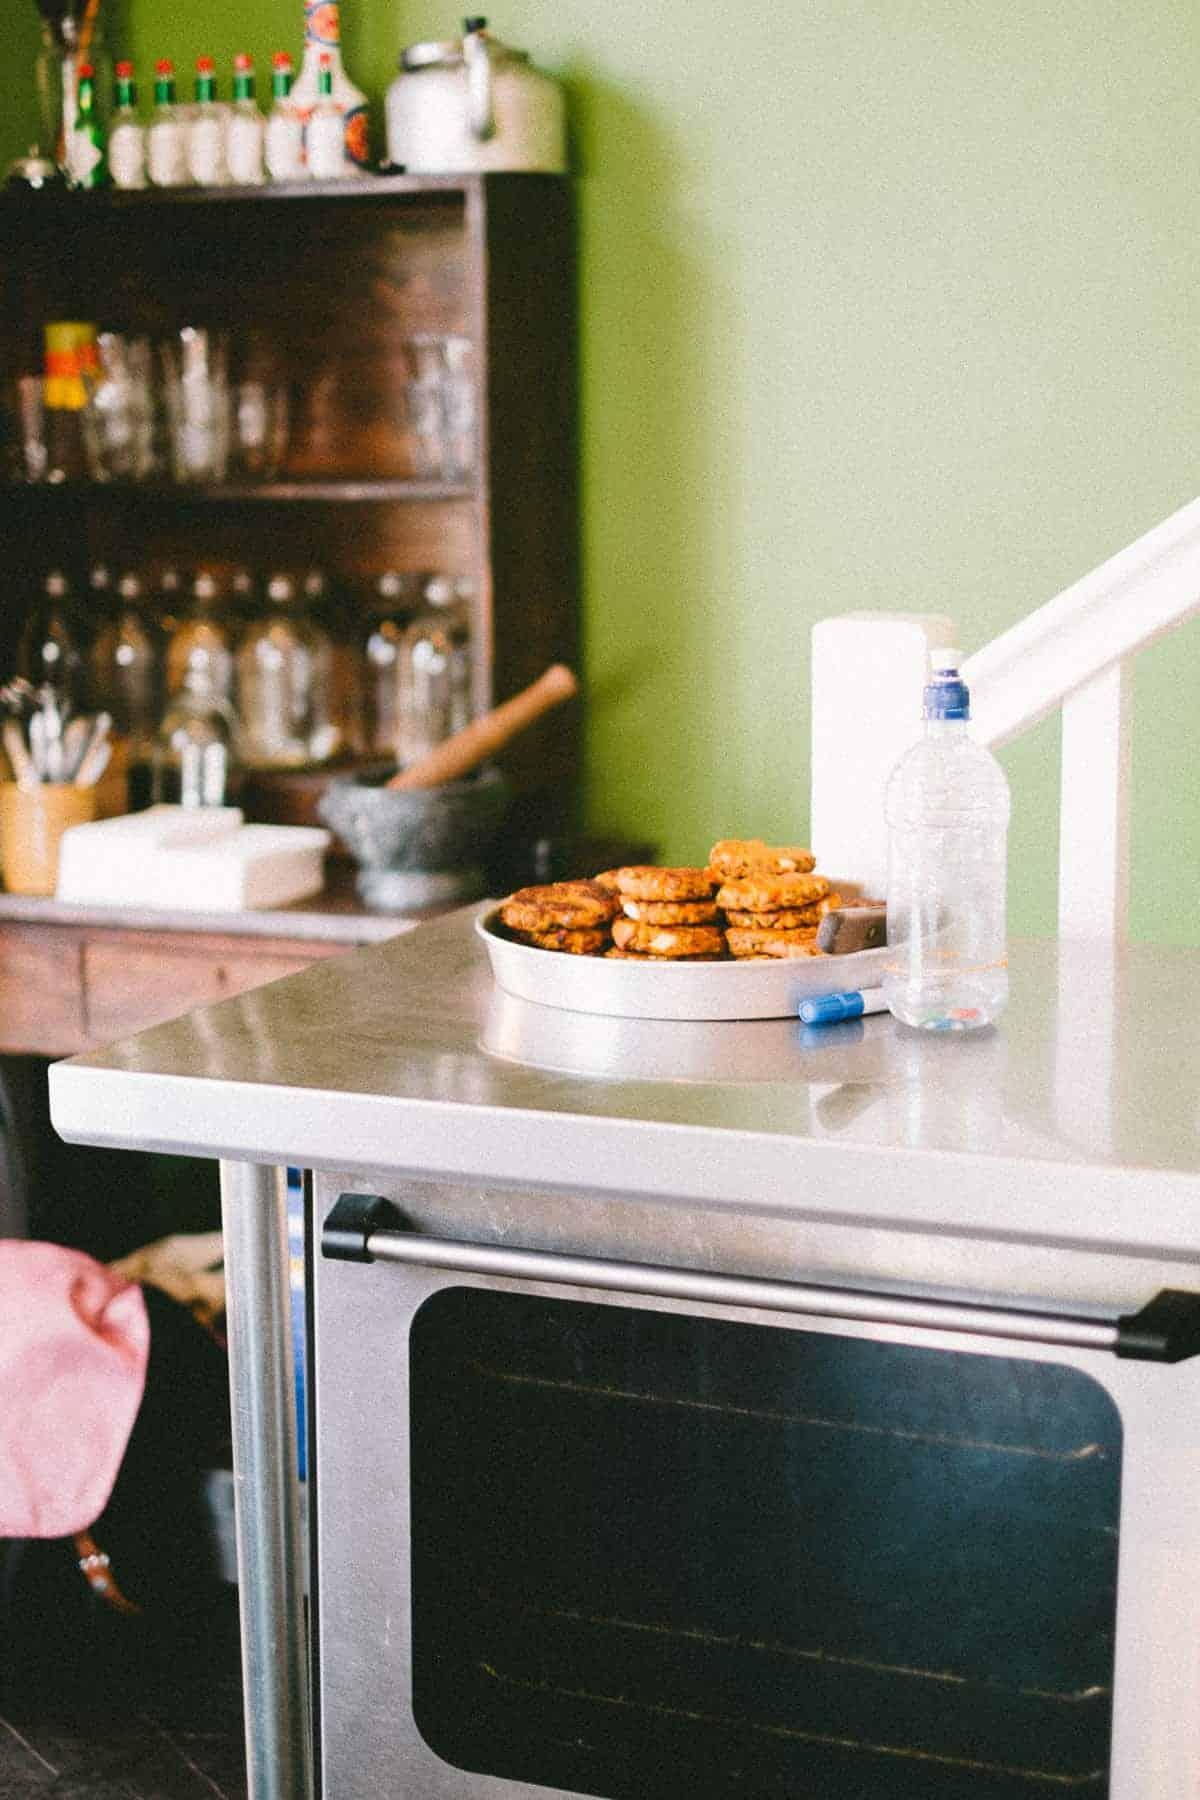 Horner and Pratt cafe